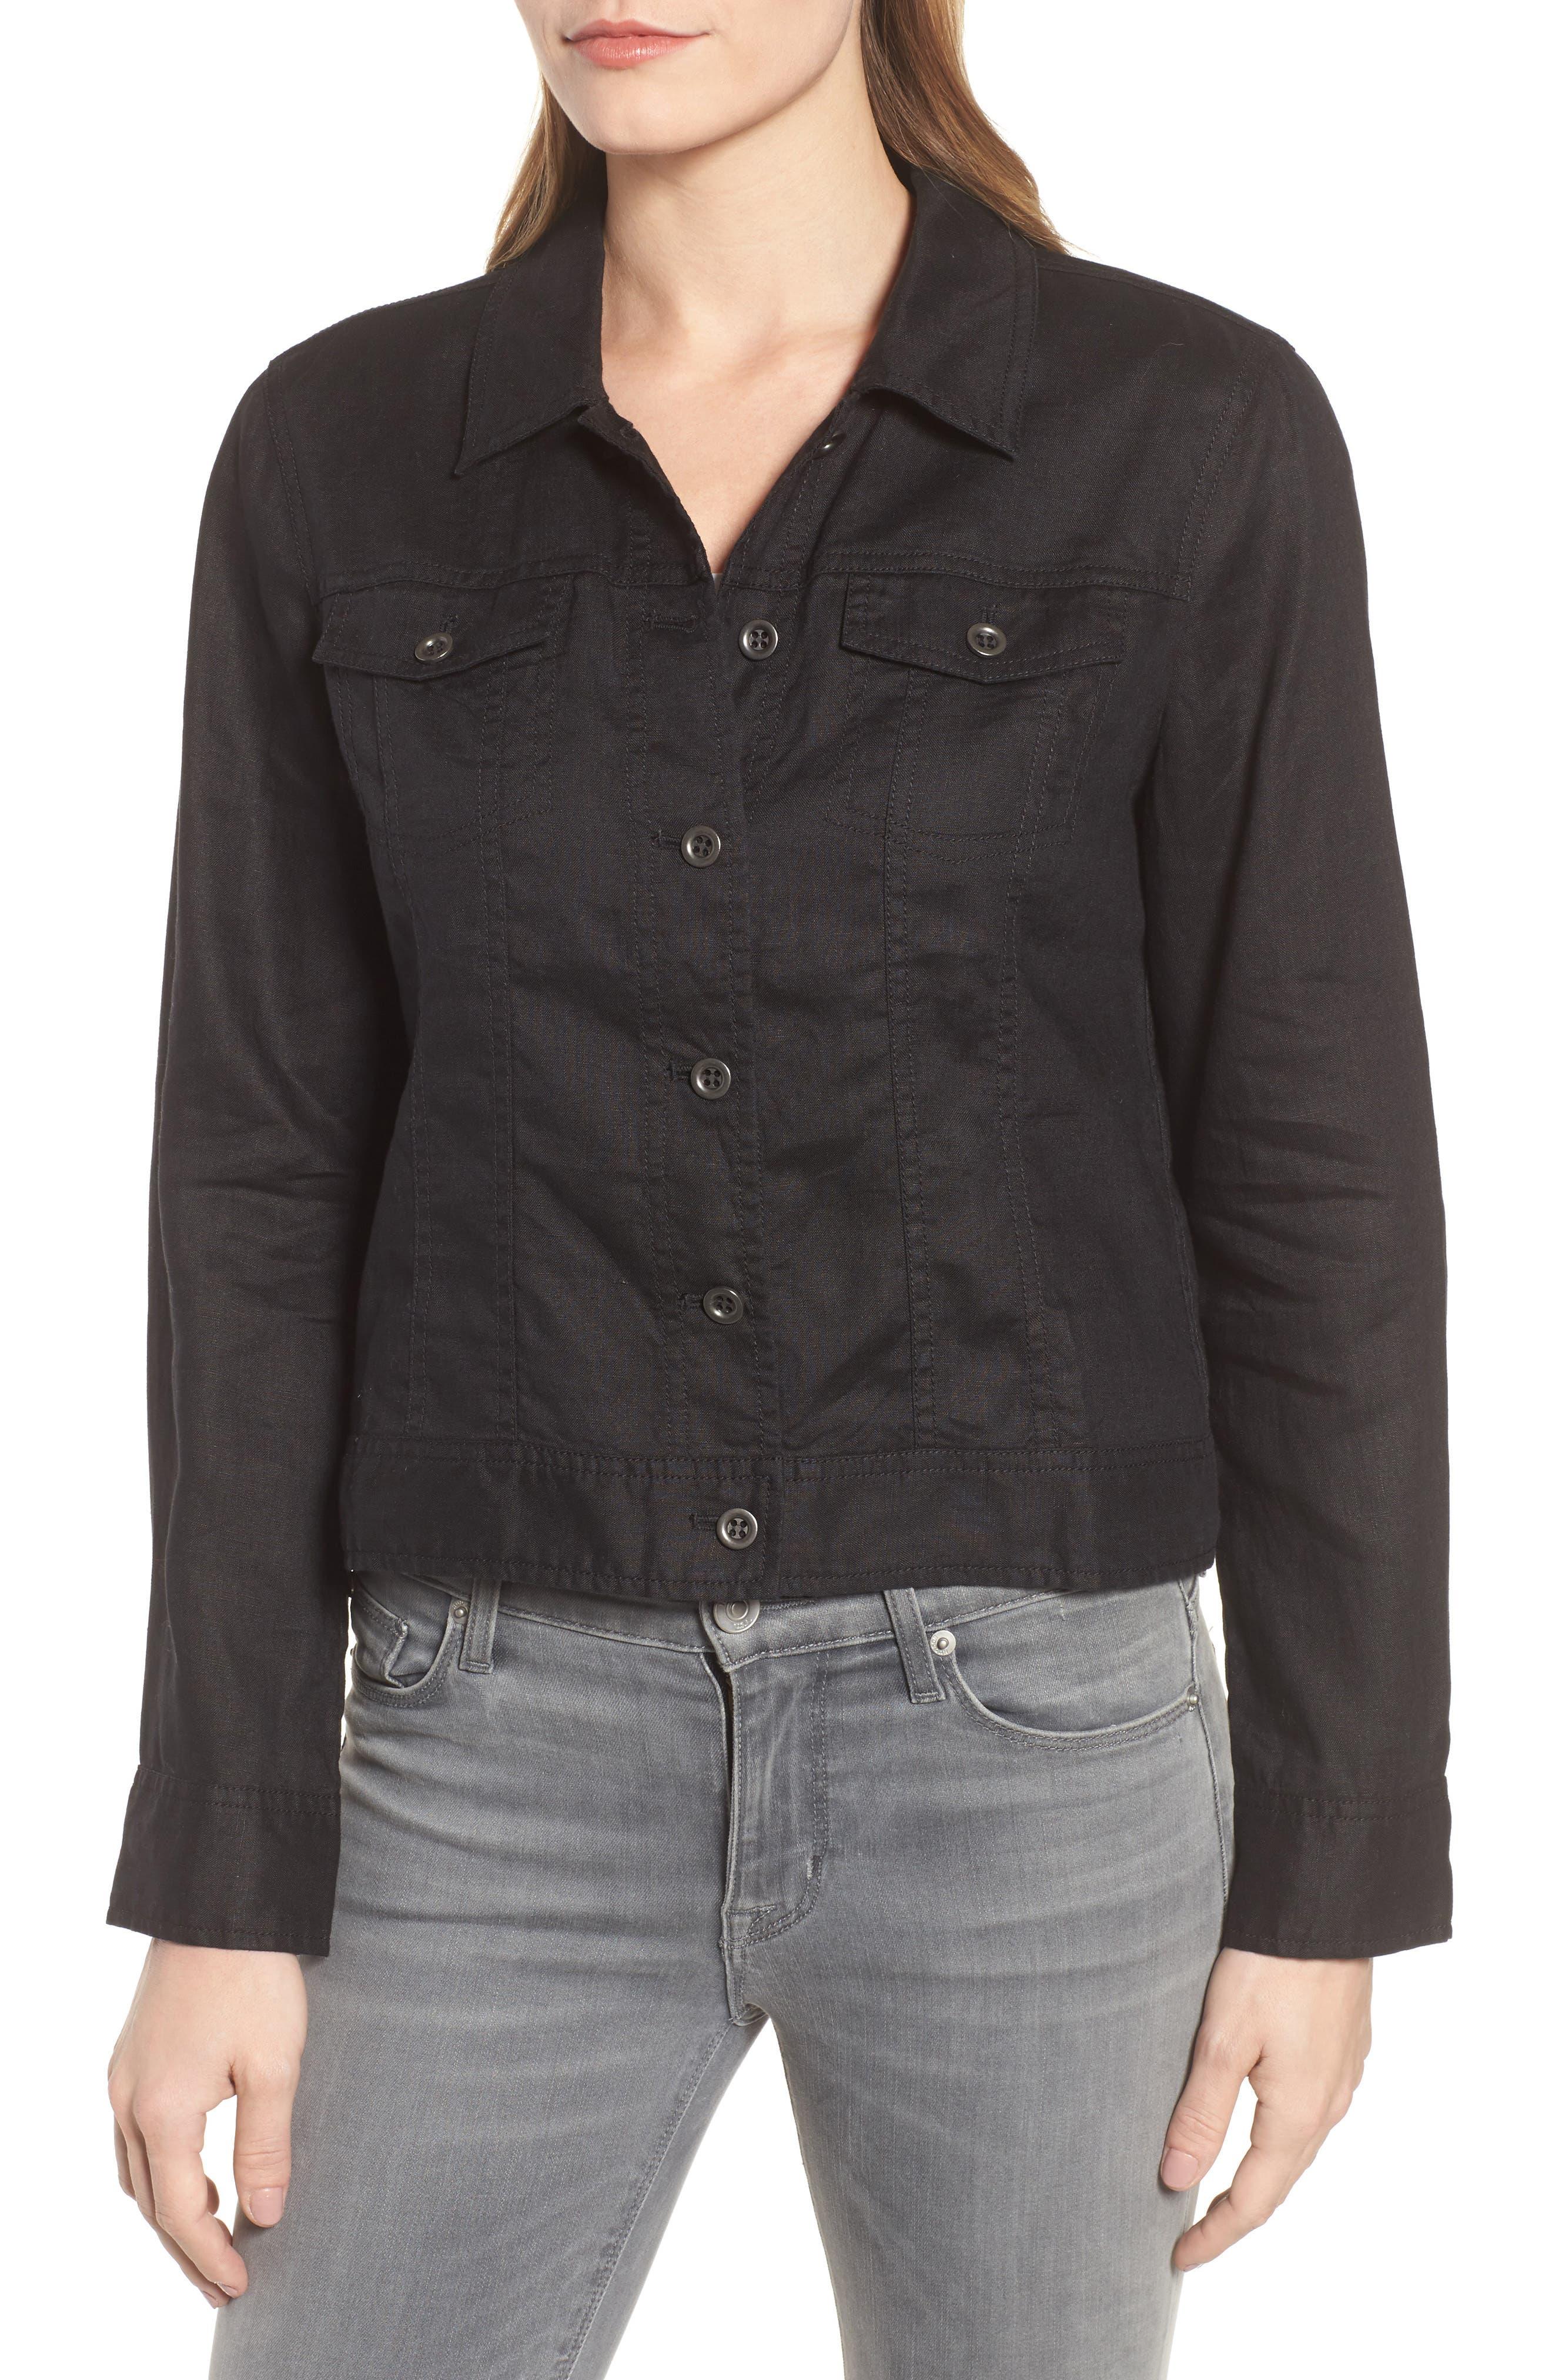 Crop Organic Linen Jacket,                             Alternate thumbnail 4, color,                             001